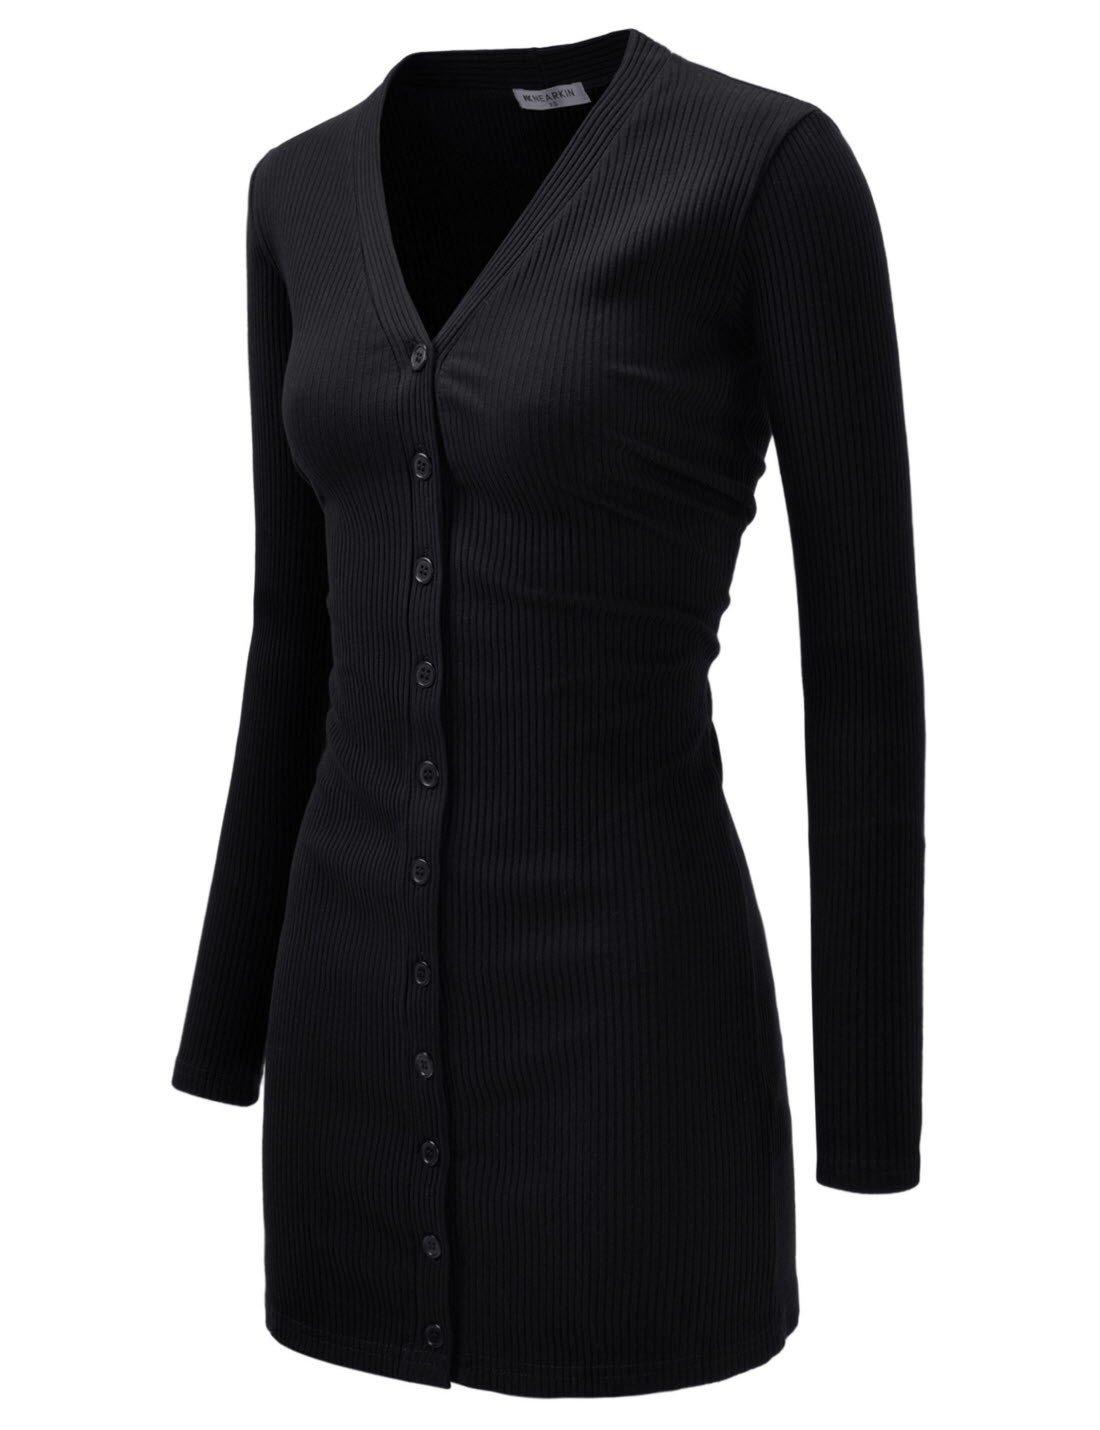 NEARKIN (NKNKWBC793) Womens Slim Cut Look Stripe Pattern Button Up Dress Long Cardigan BLACK US M(Tag size L)